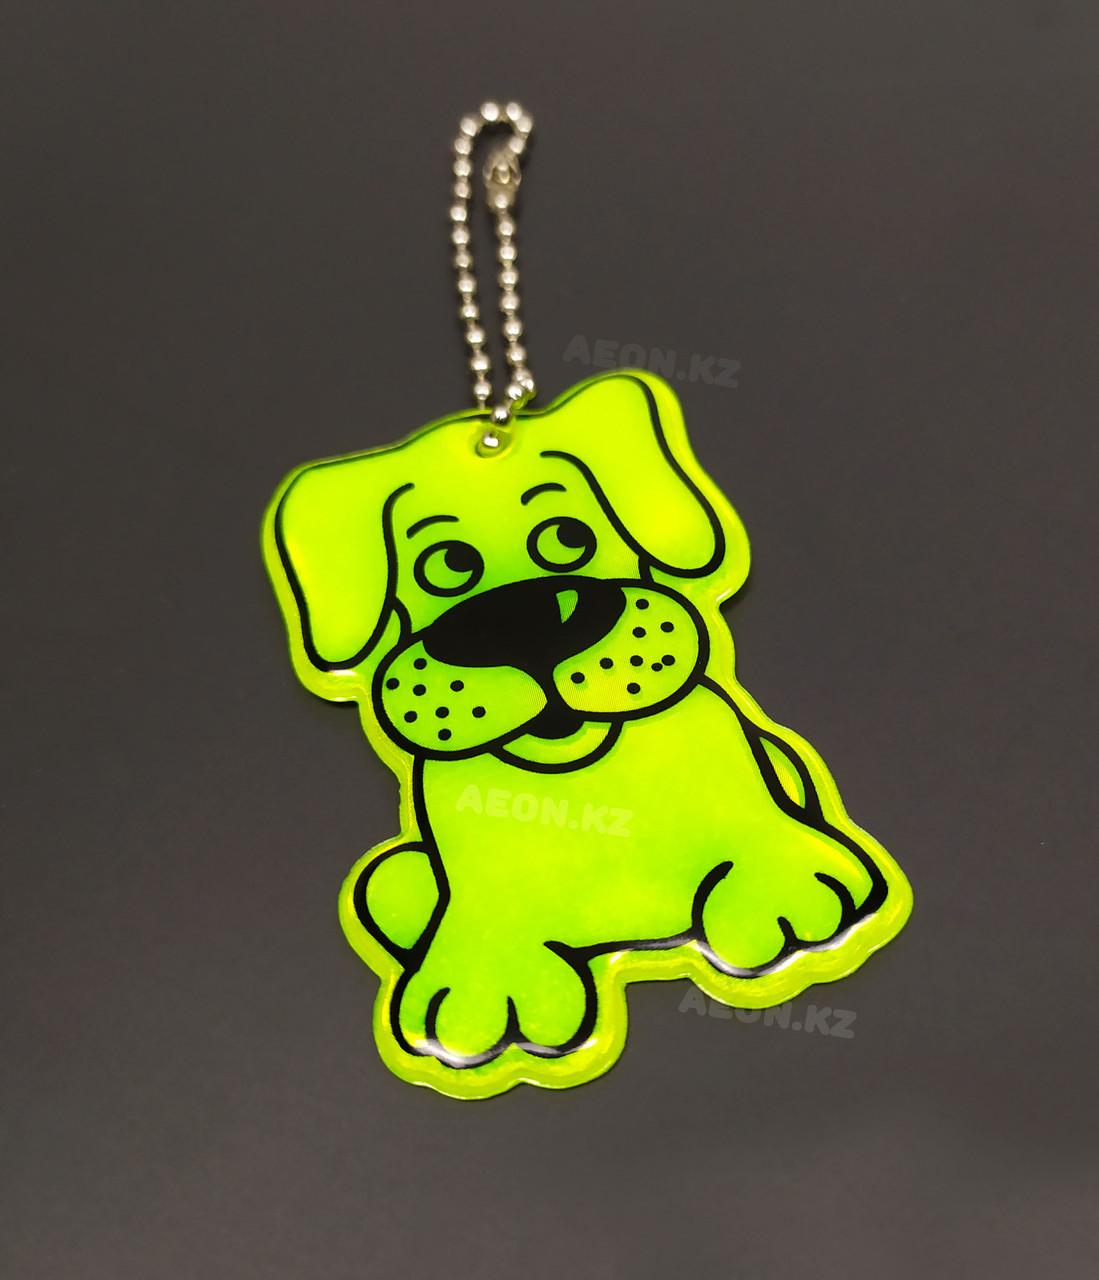 Брелок светоотражающий (Пёс)